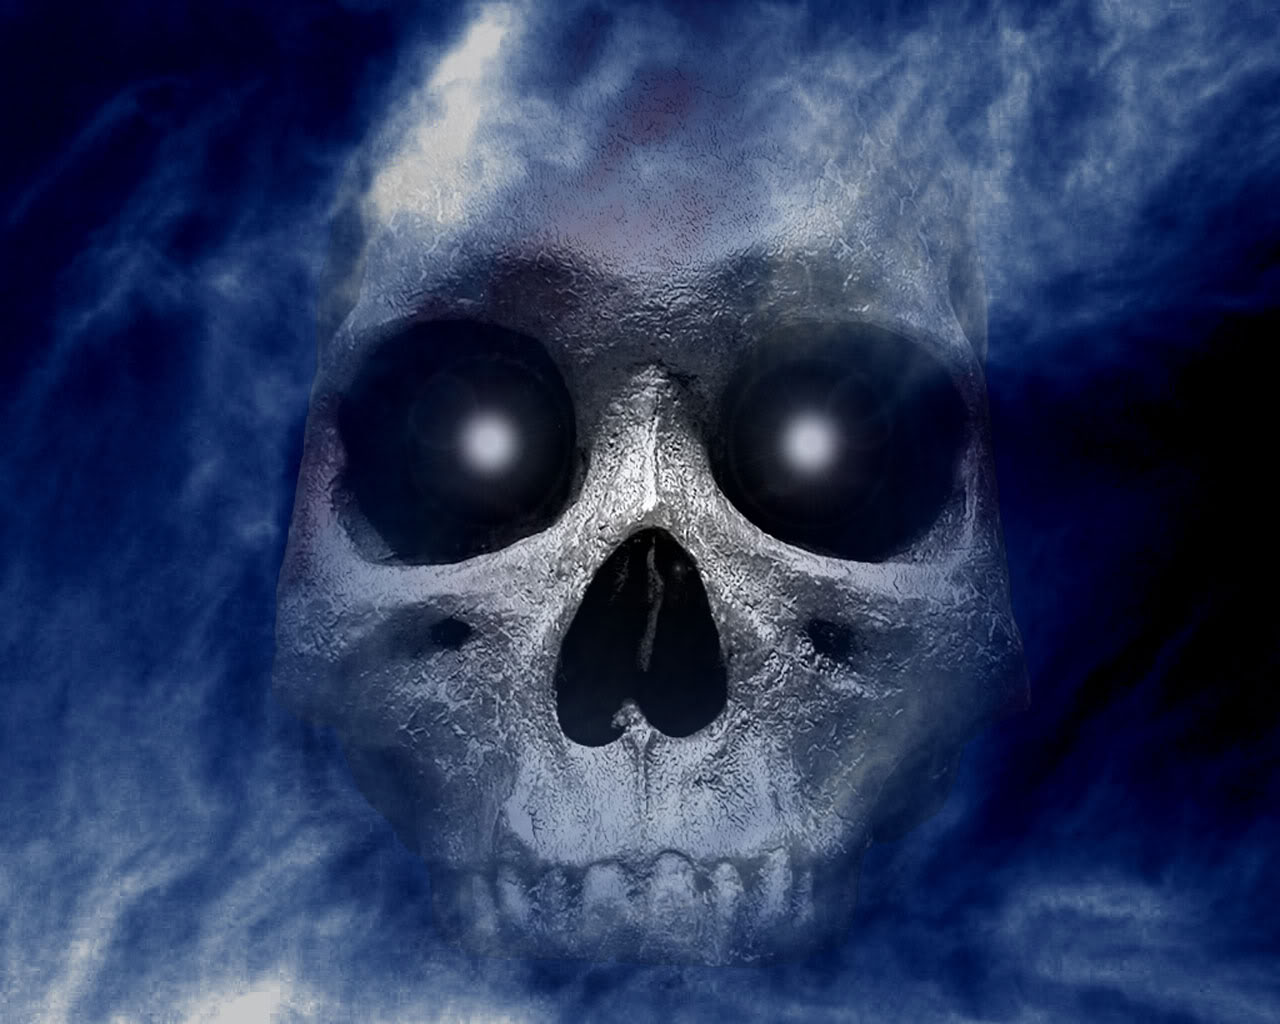 http://1.bp.blogspot.com/-676XjEl3CBo/UFx_Nu9Ma6I/AAAAAAAAAJU/DRv2B_IOJtA/s1600/halloween-skull-wallpaper.jpg